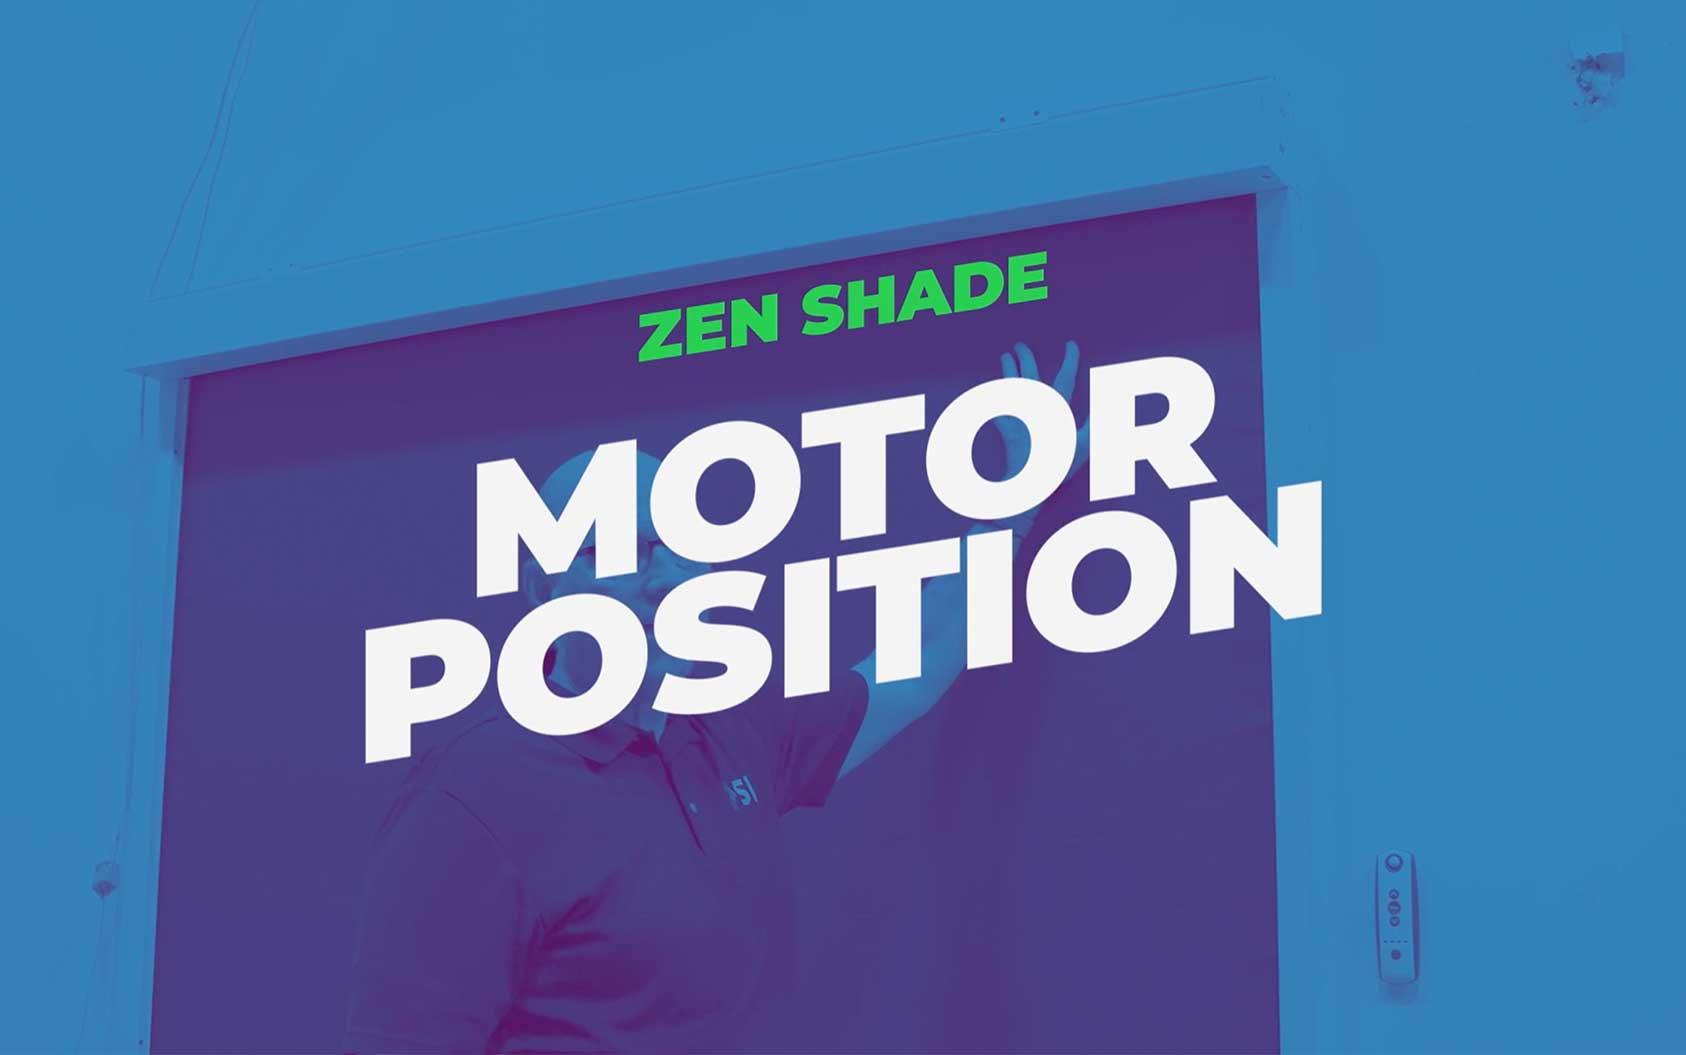 How to Determine Motor Position on Zen